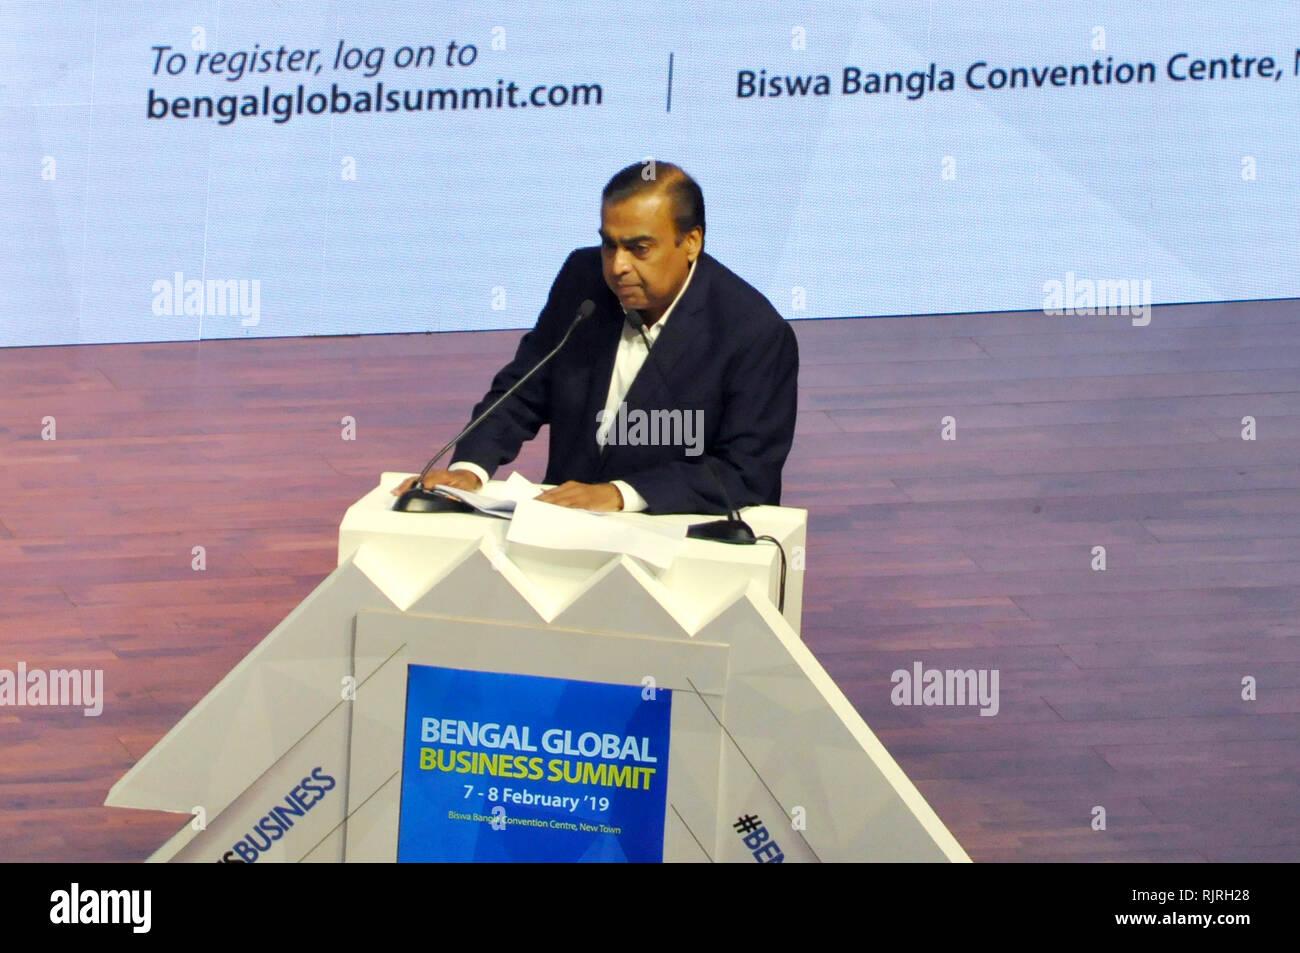 Reliance Industries Chairman Mukesh Ambani address during the inauguration of Bengal Global Business Summit 2019 at New Town. (Photo by Saikat Paul/Pacific Press) - Stock Image